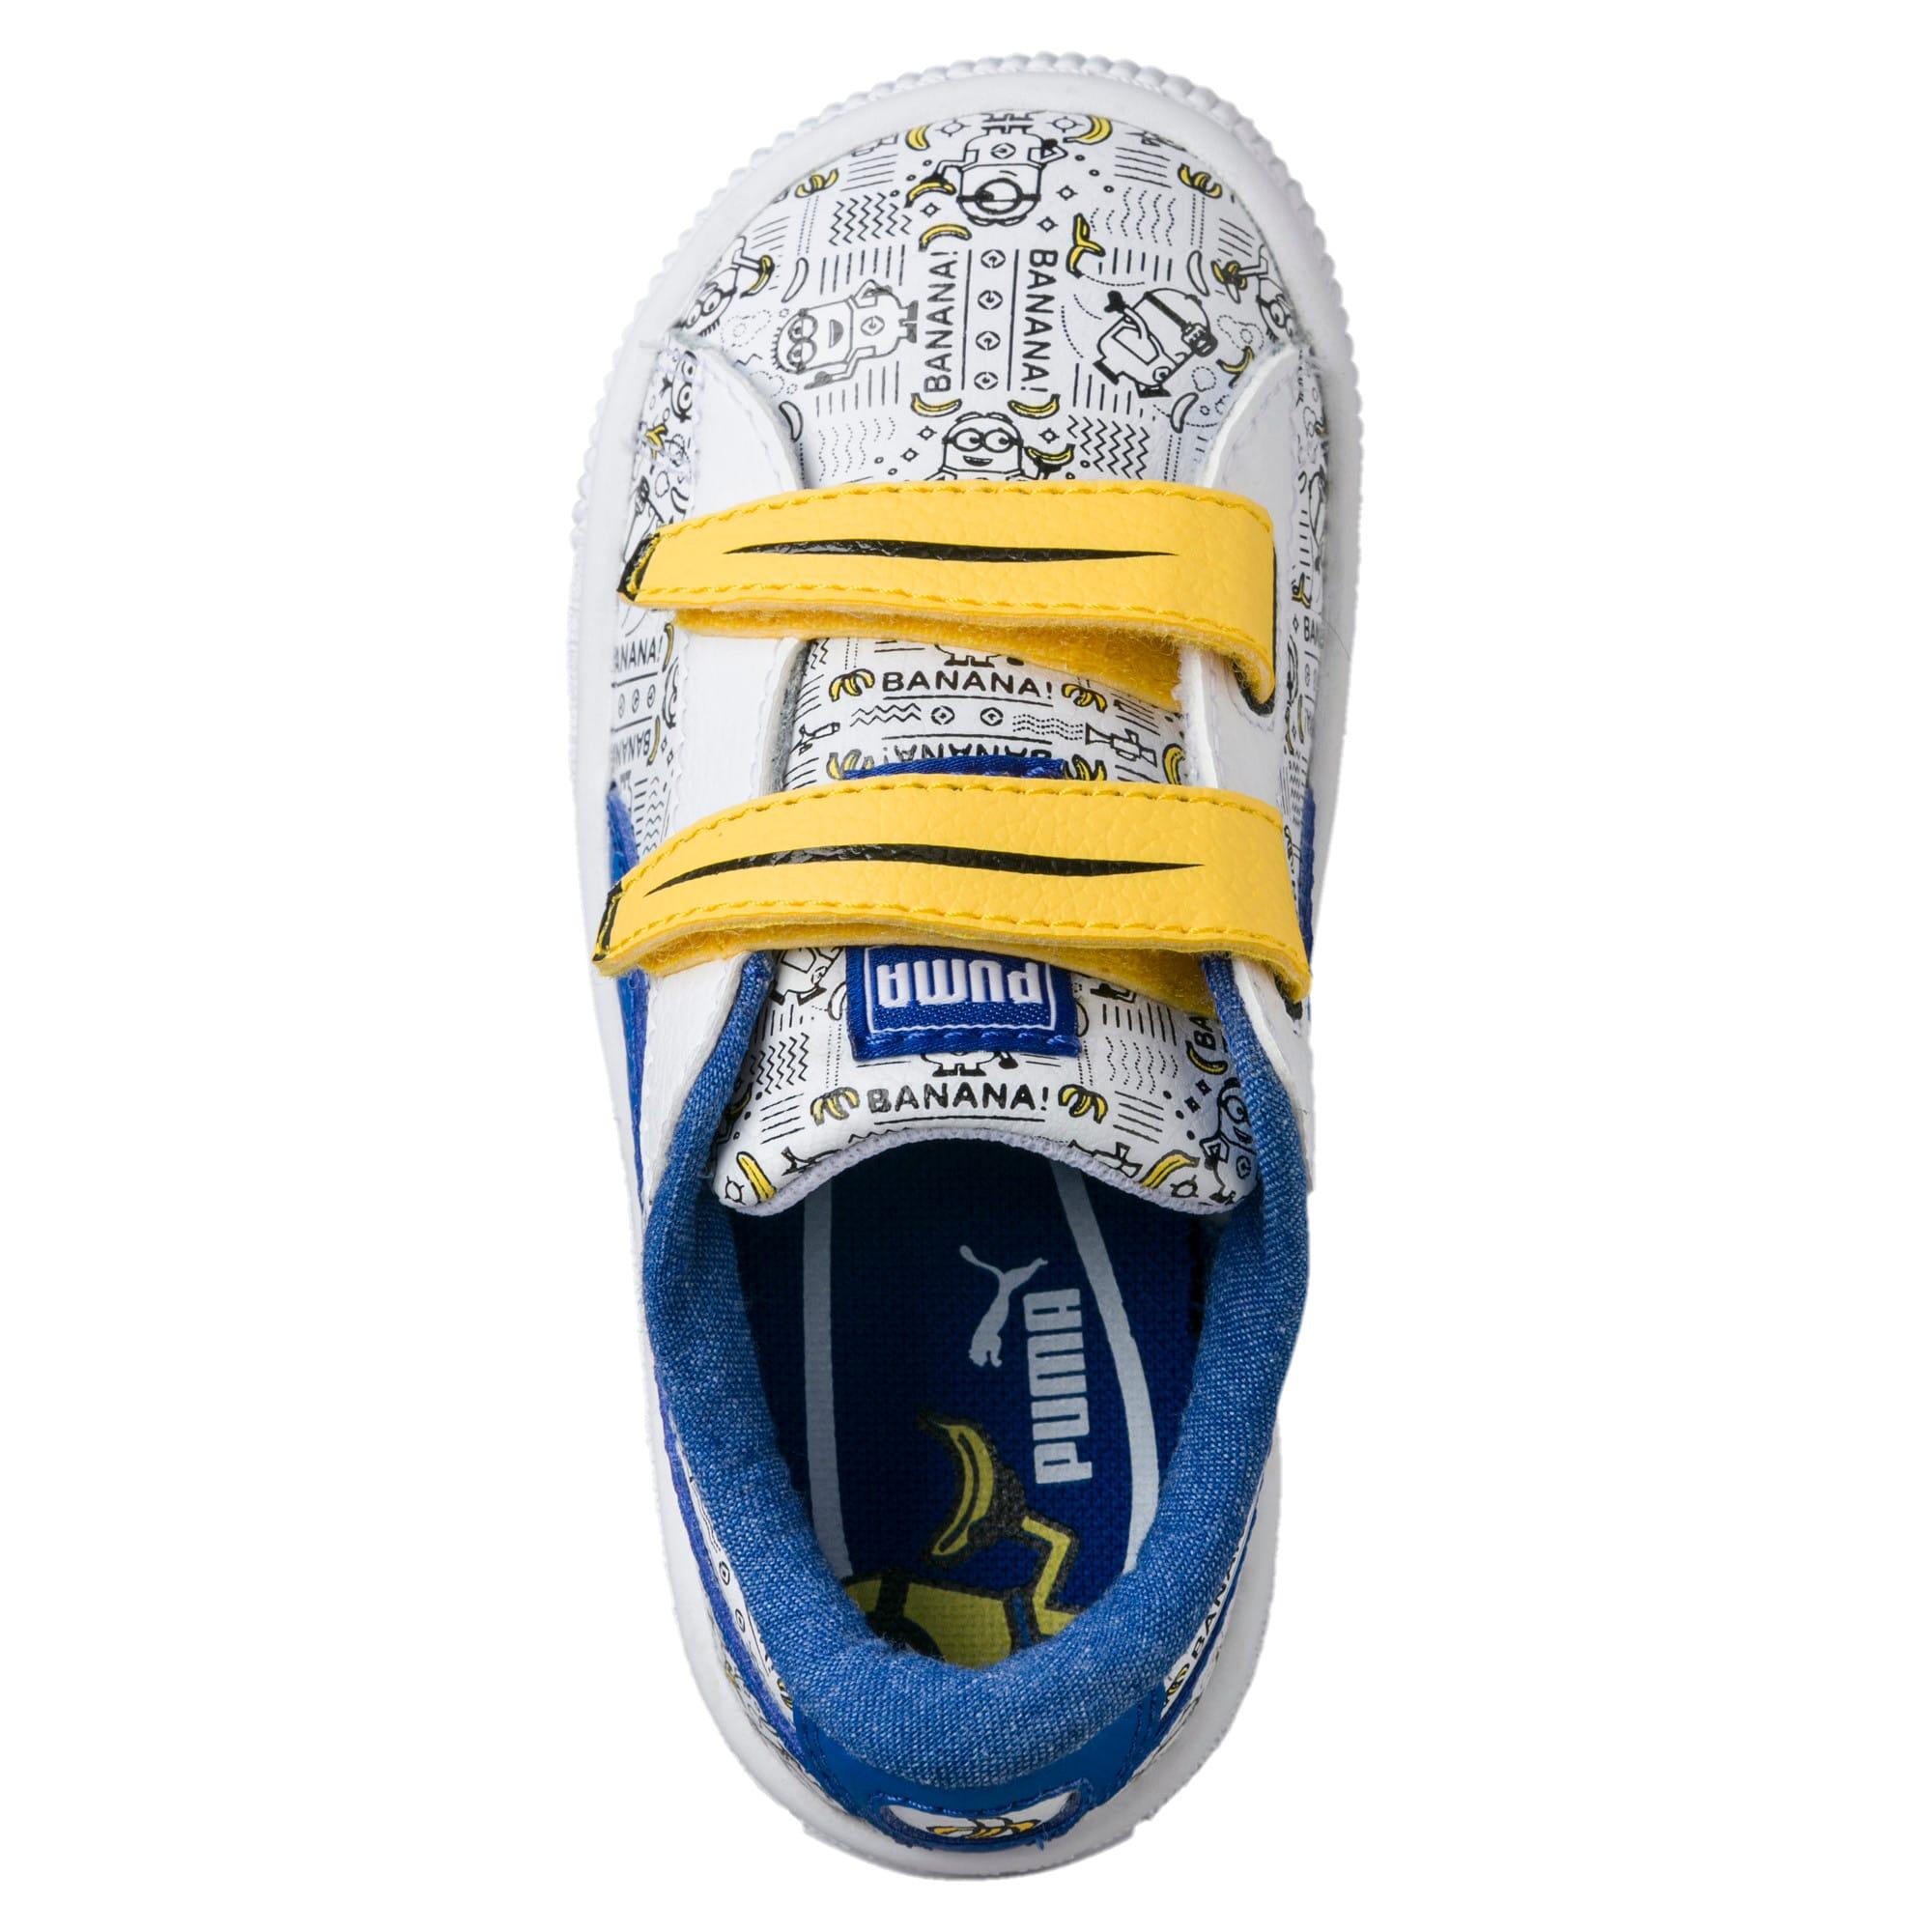 Thumbnail 5 of Minions Basket Little Kids' Shoes, Puma White-Lapis Blue, medium